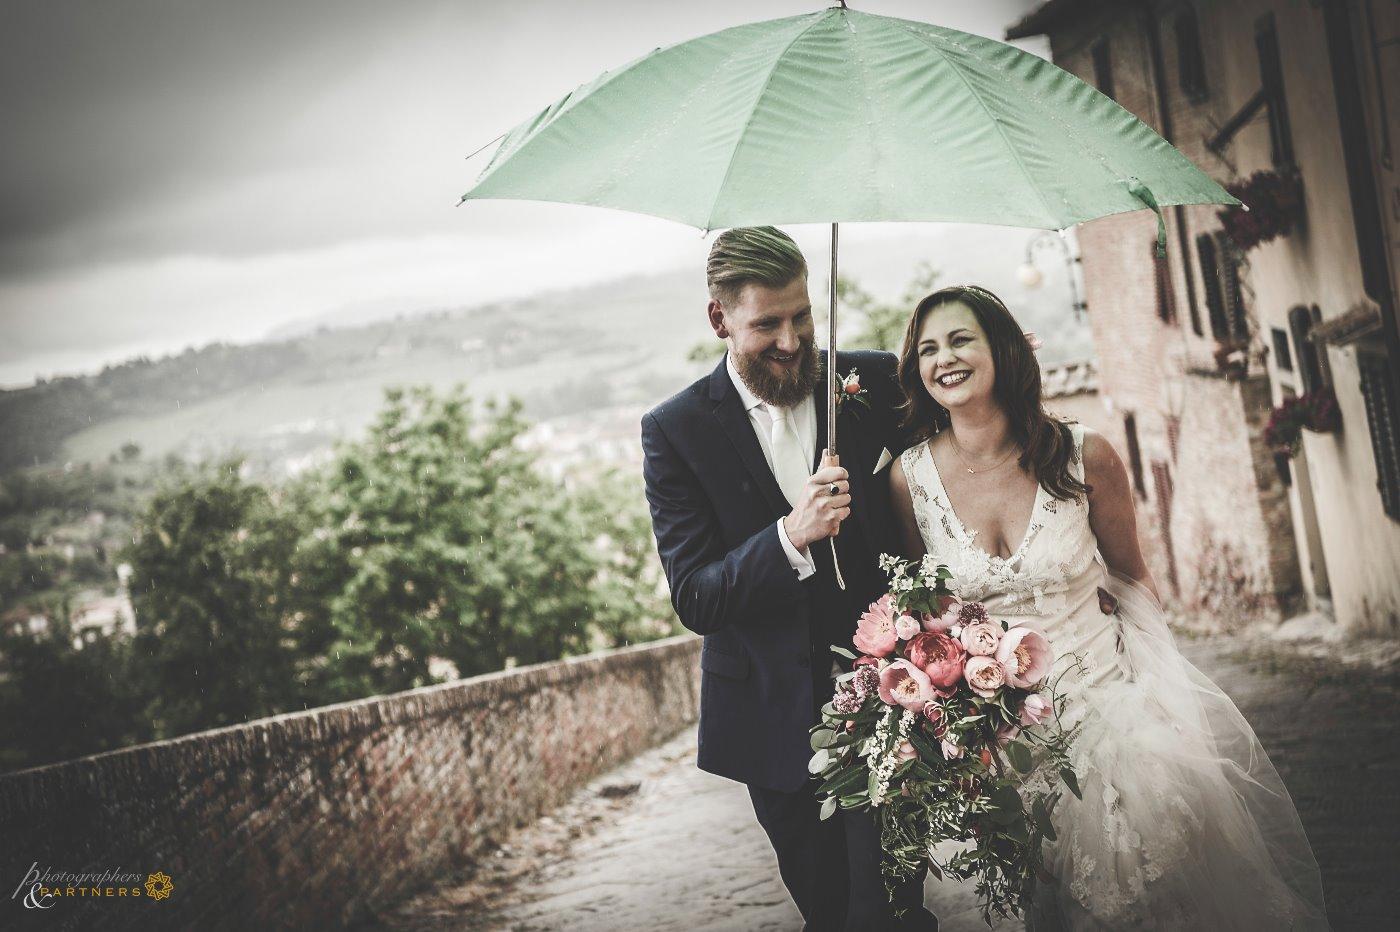 photos_weddings_castello_oliveto_15.jpg